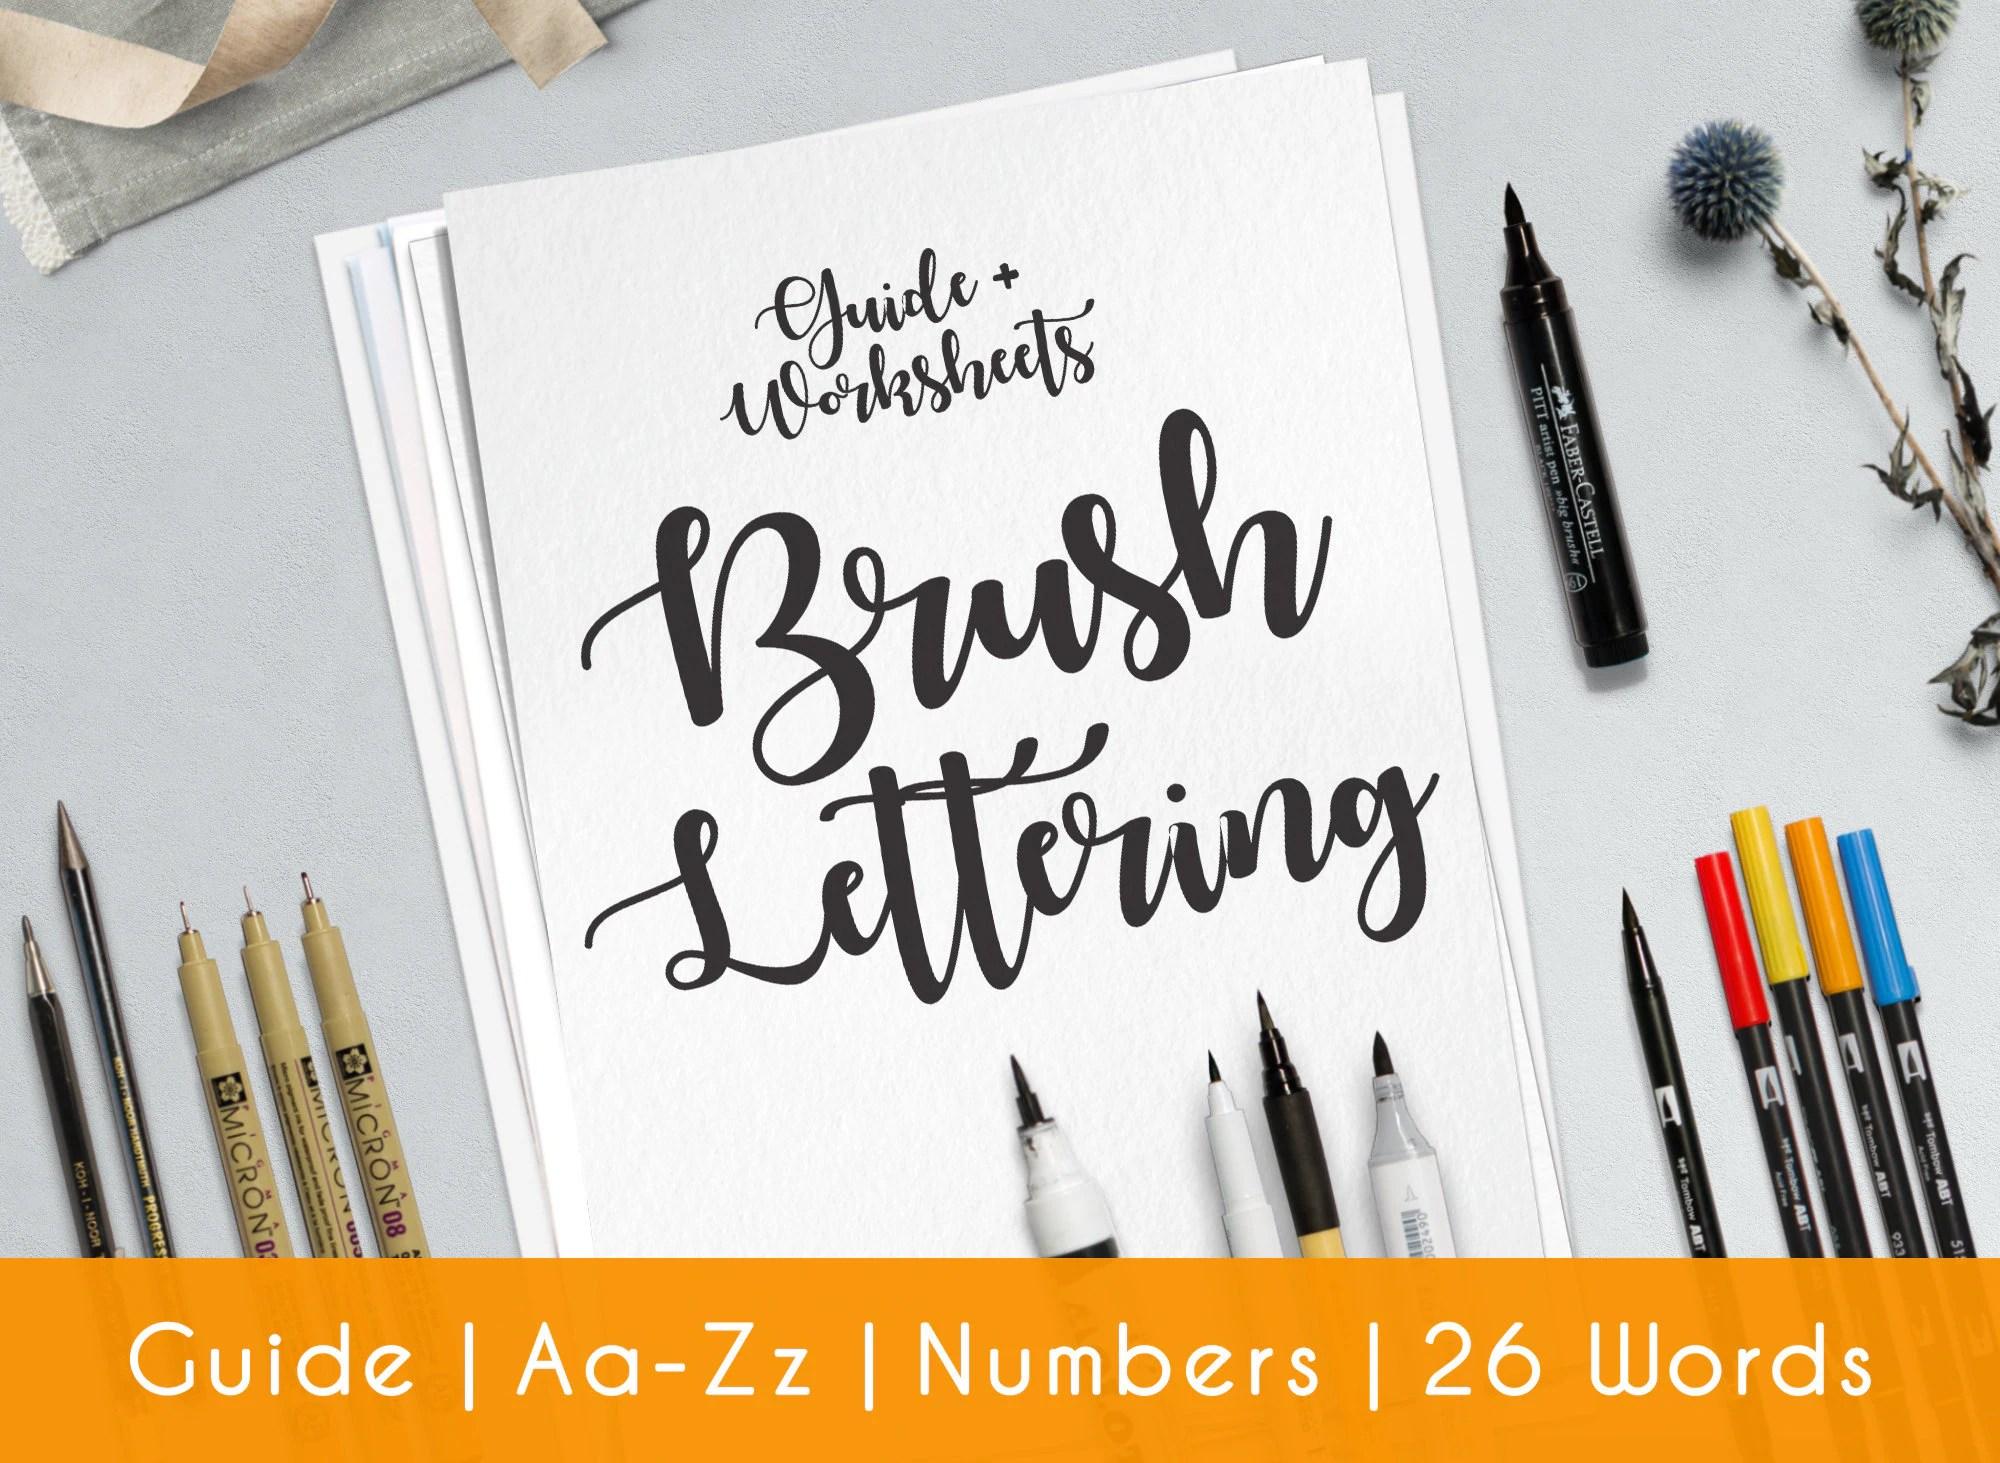 Brush Hand Lettering Worksheets 33 Practice Sheets Guide